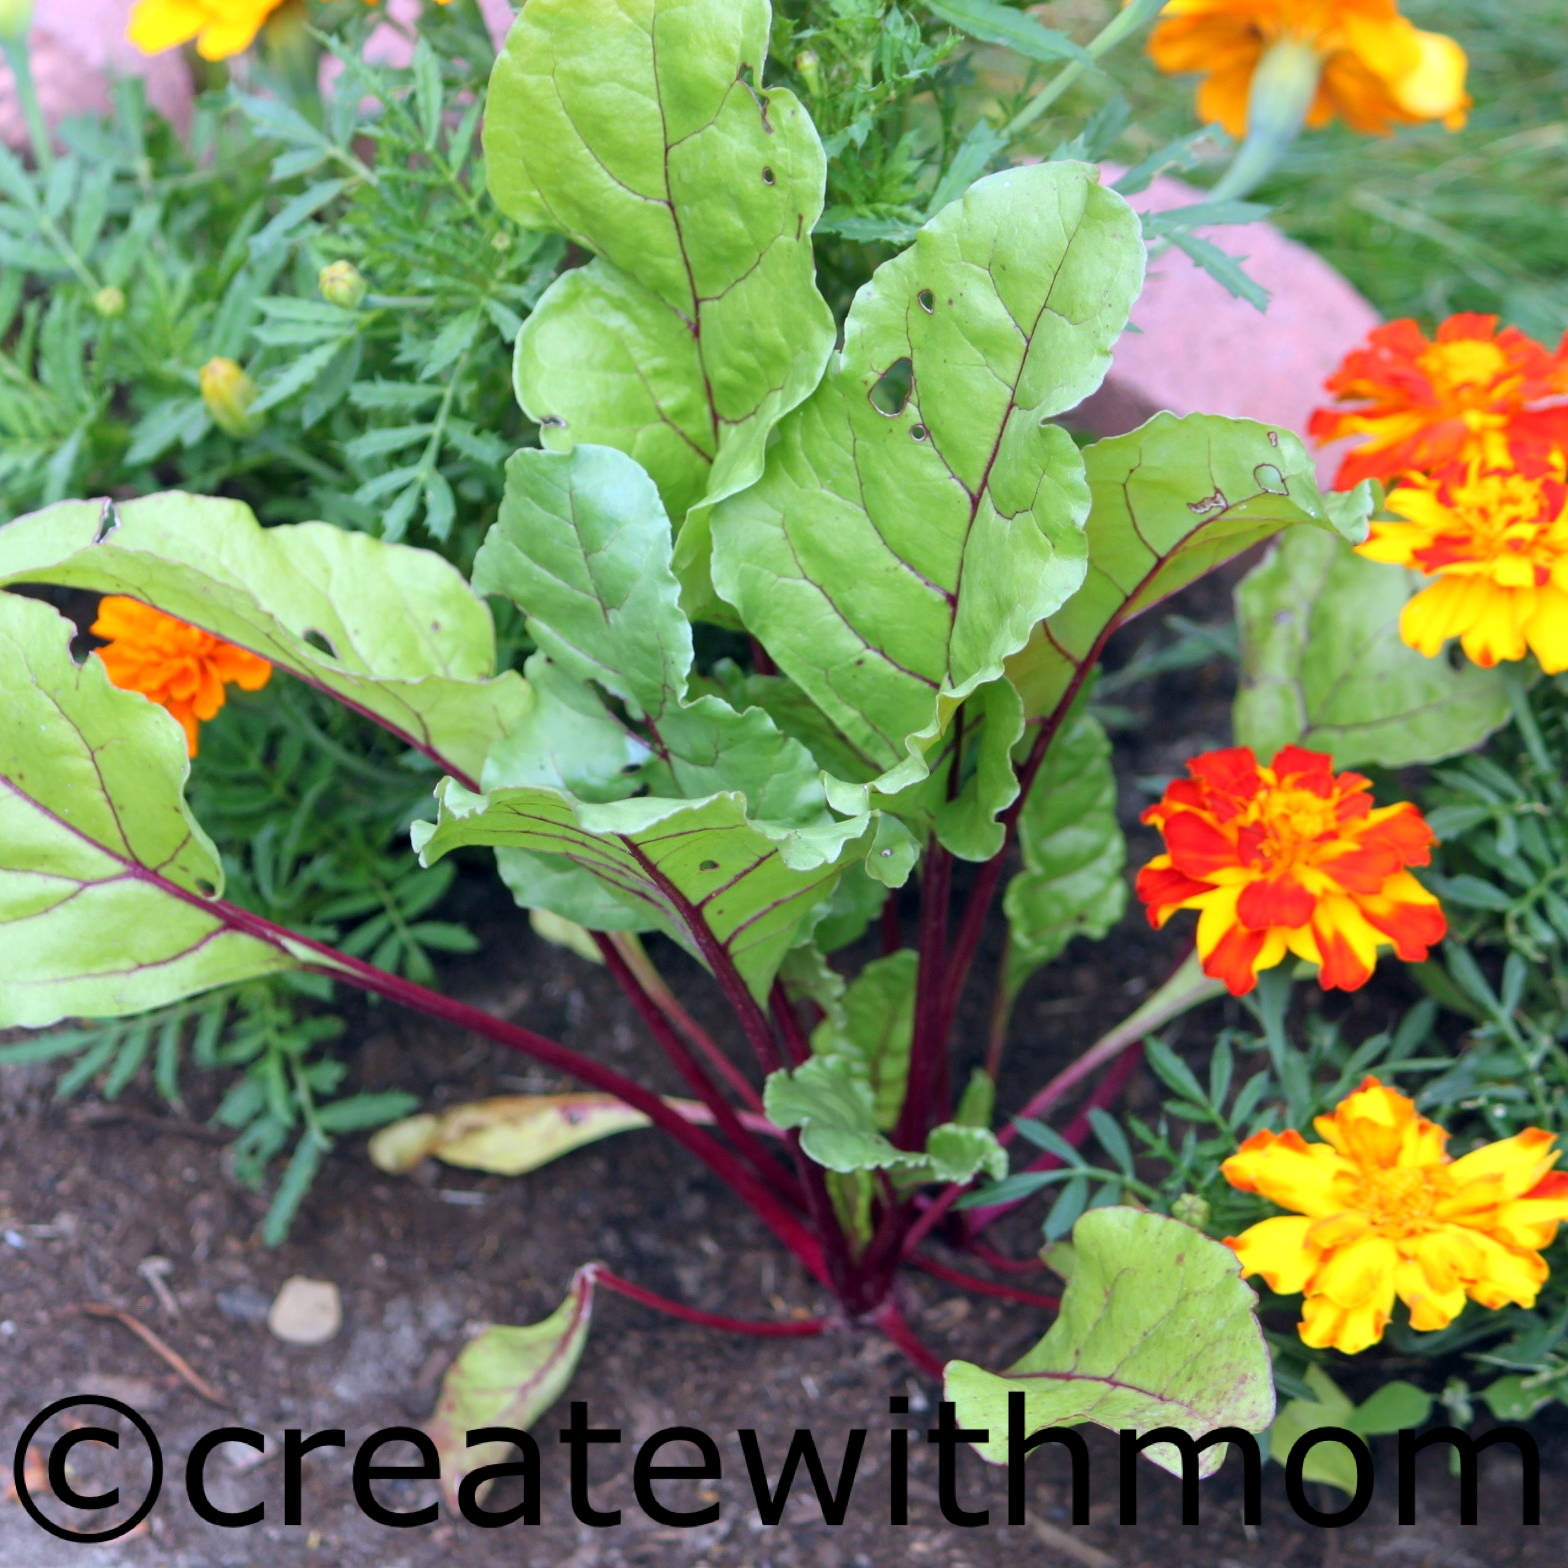 Beetroot plant